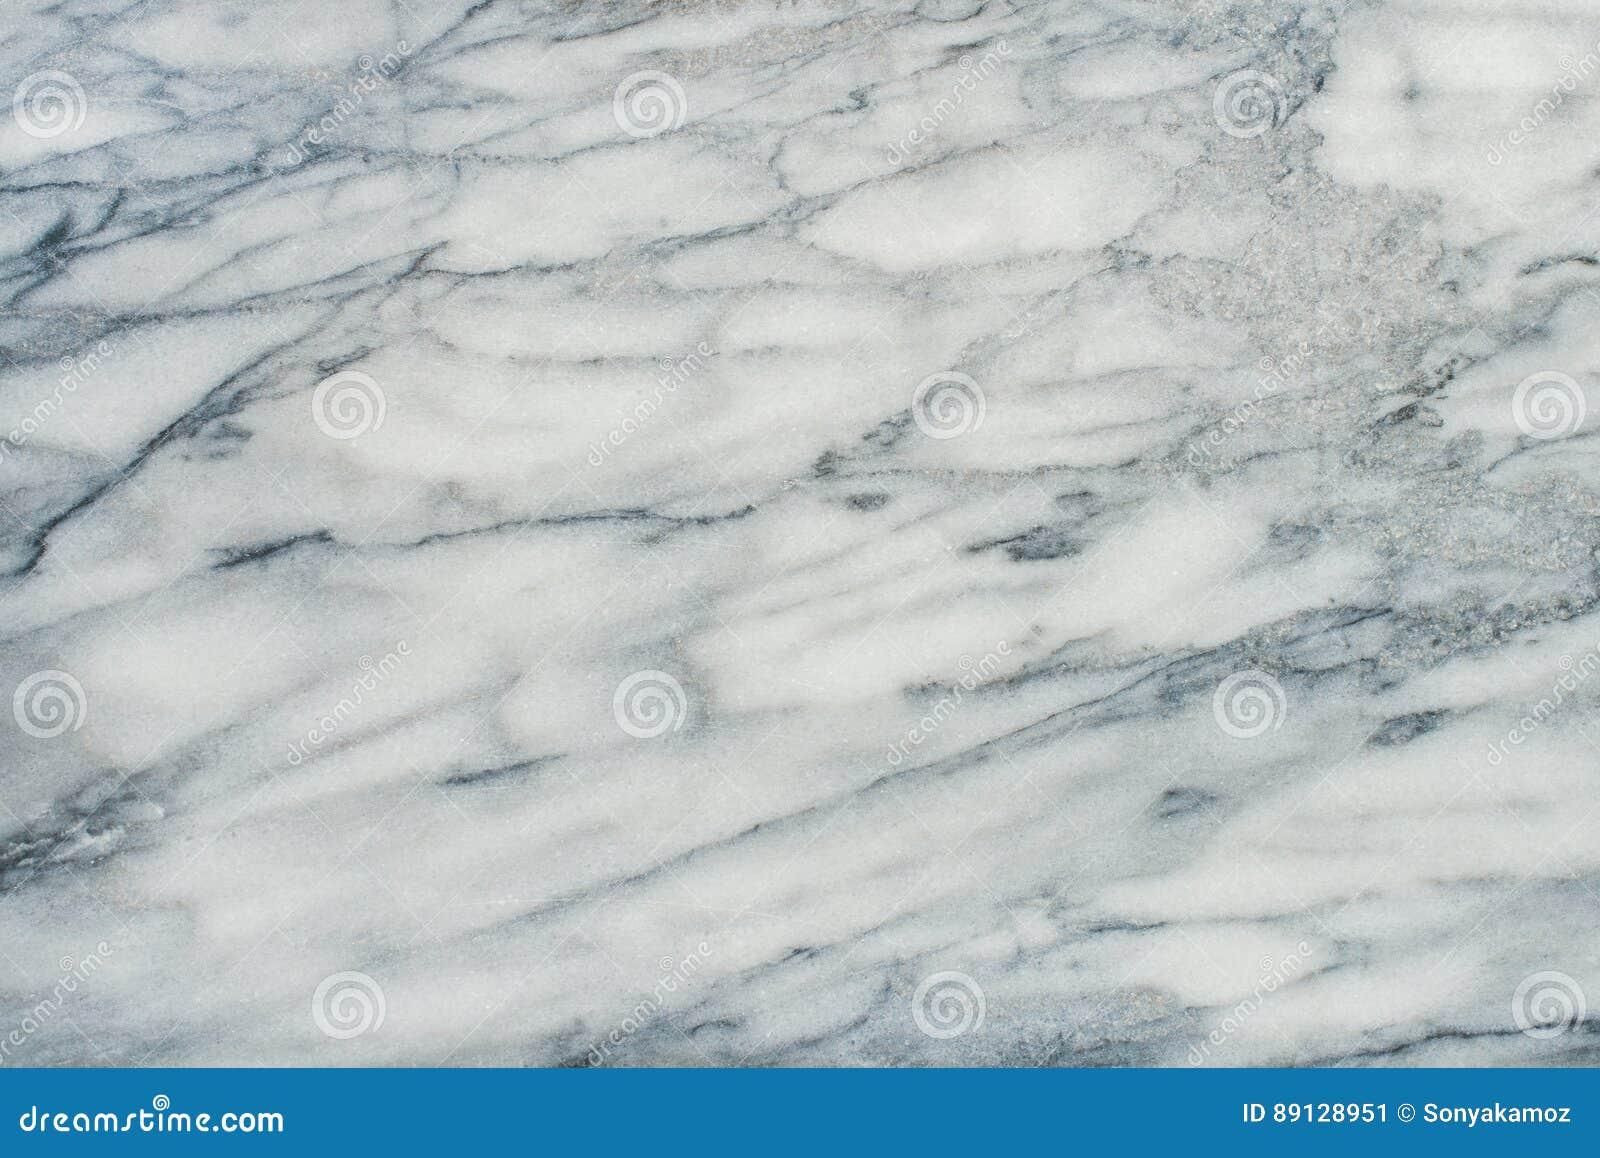 Fondo De Piedra De M Rmol Natural Negro Gris Blanco